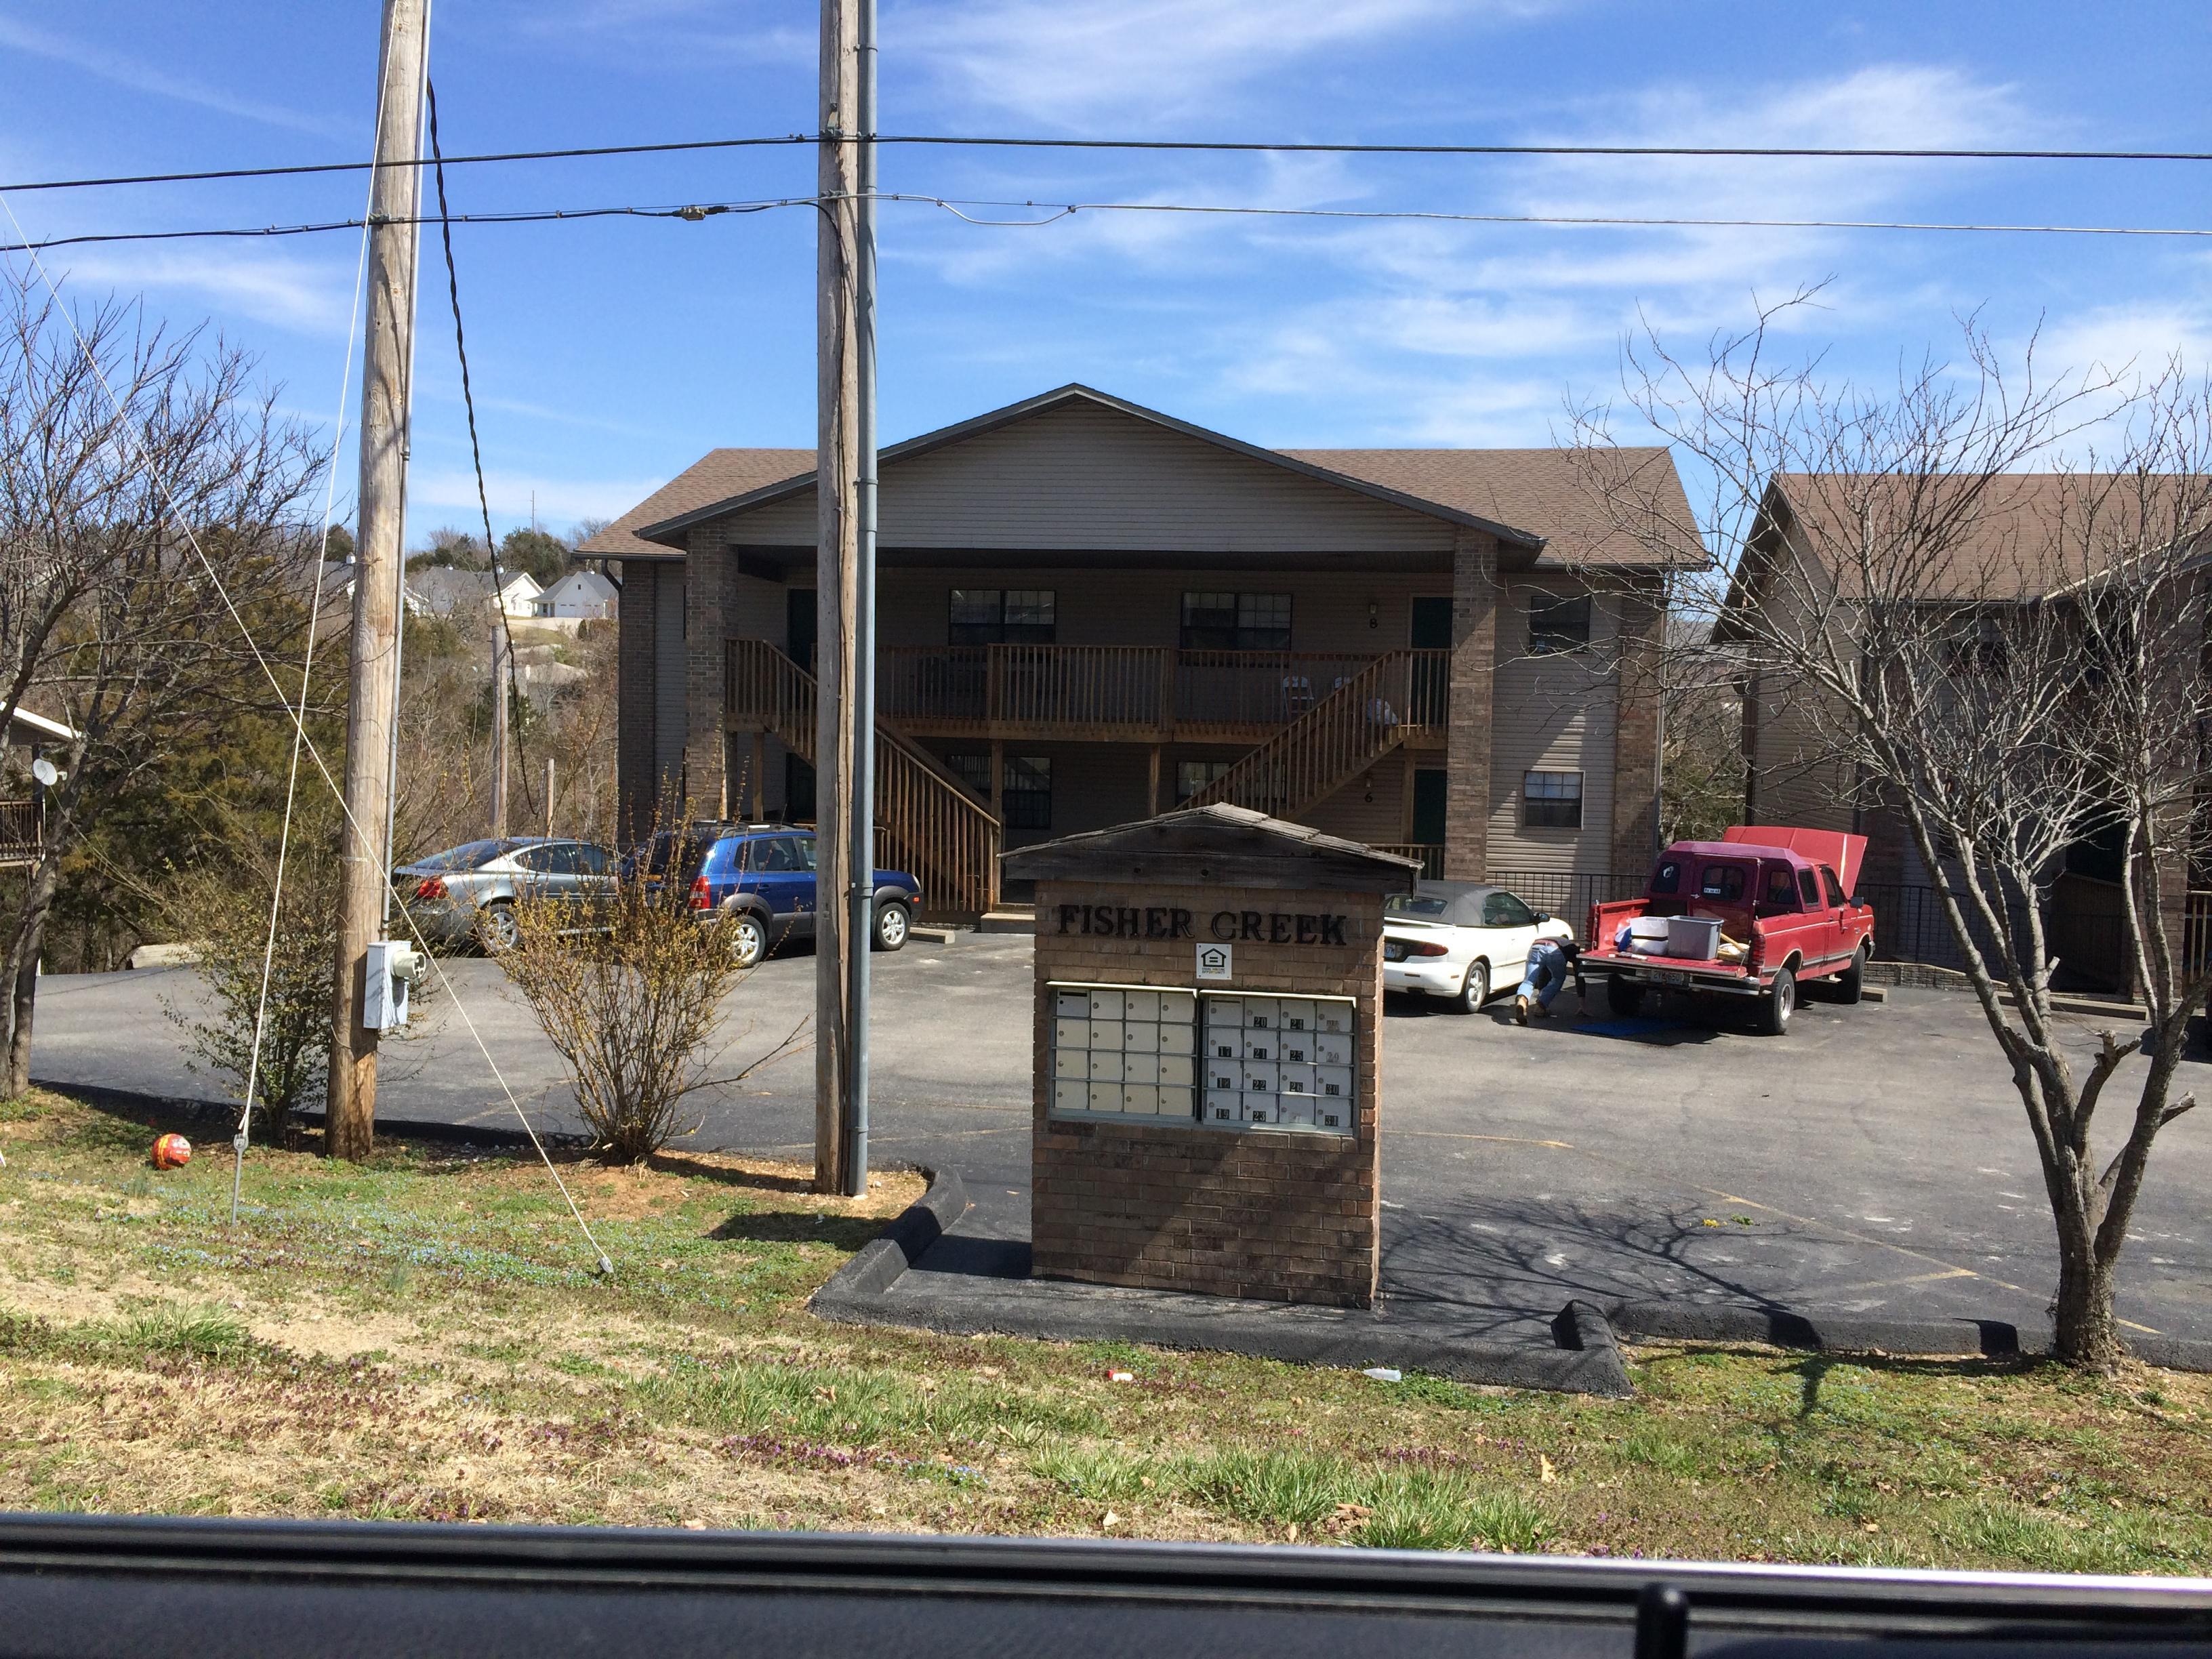 Fisher Creek Apartments 1 Church Drive Kimberling City